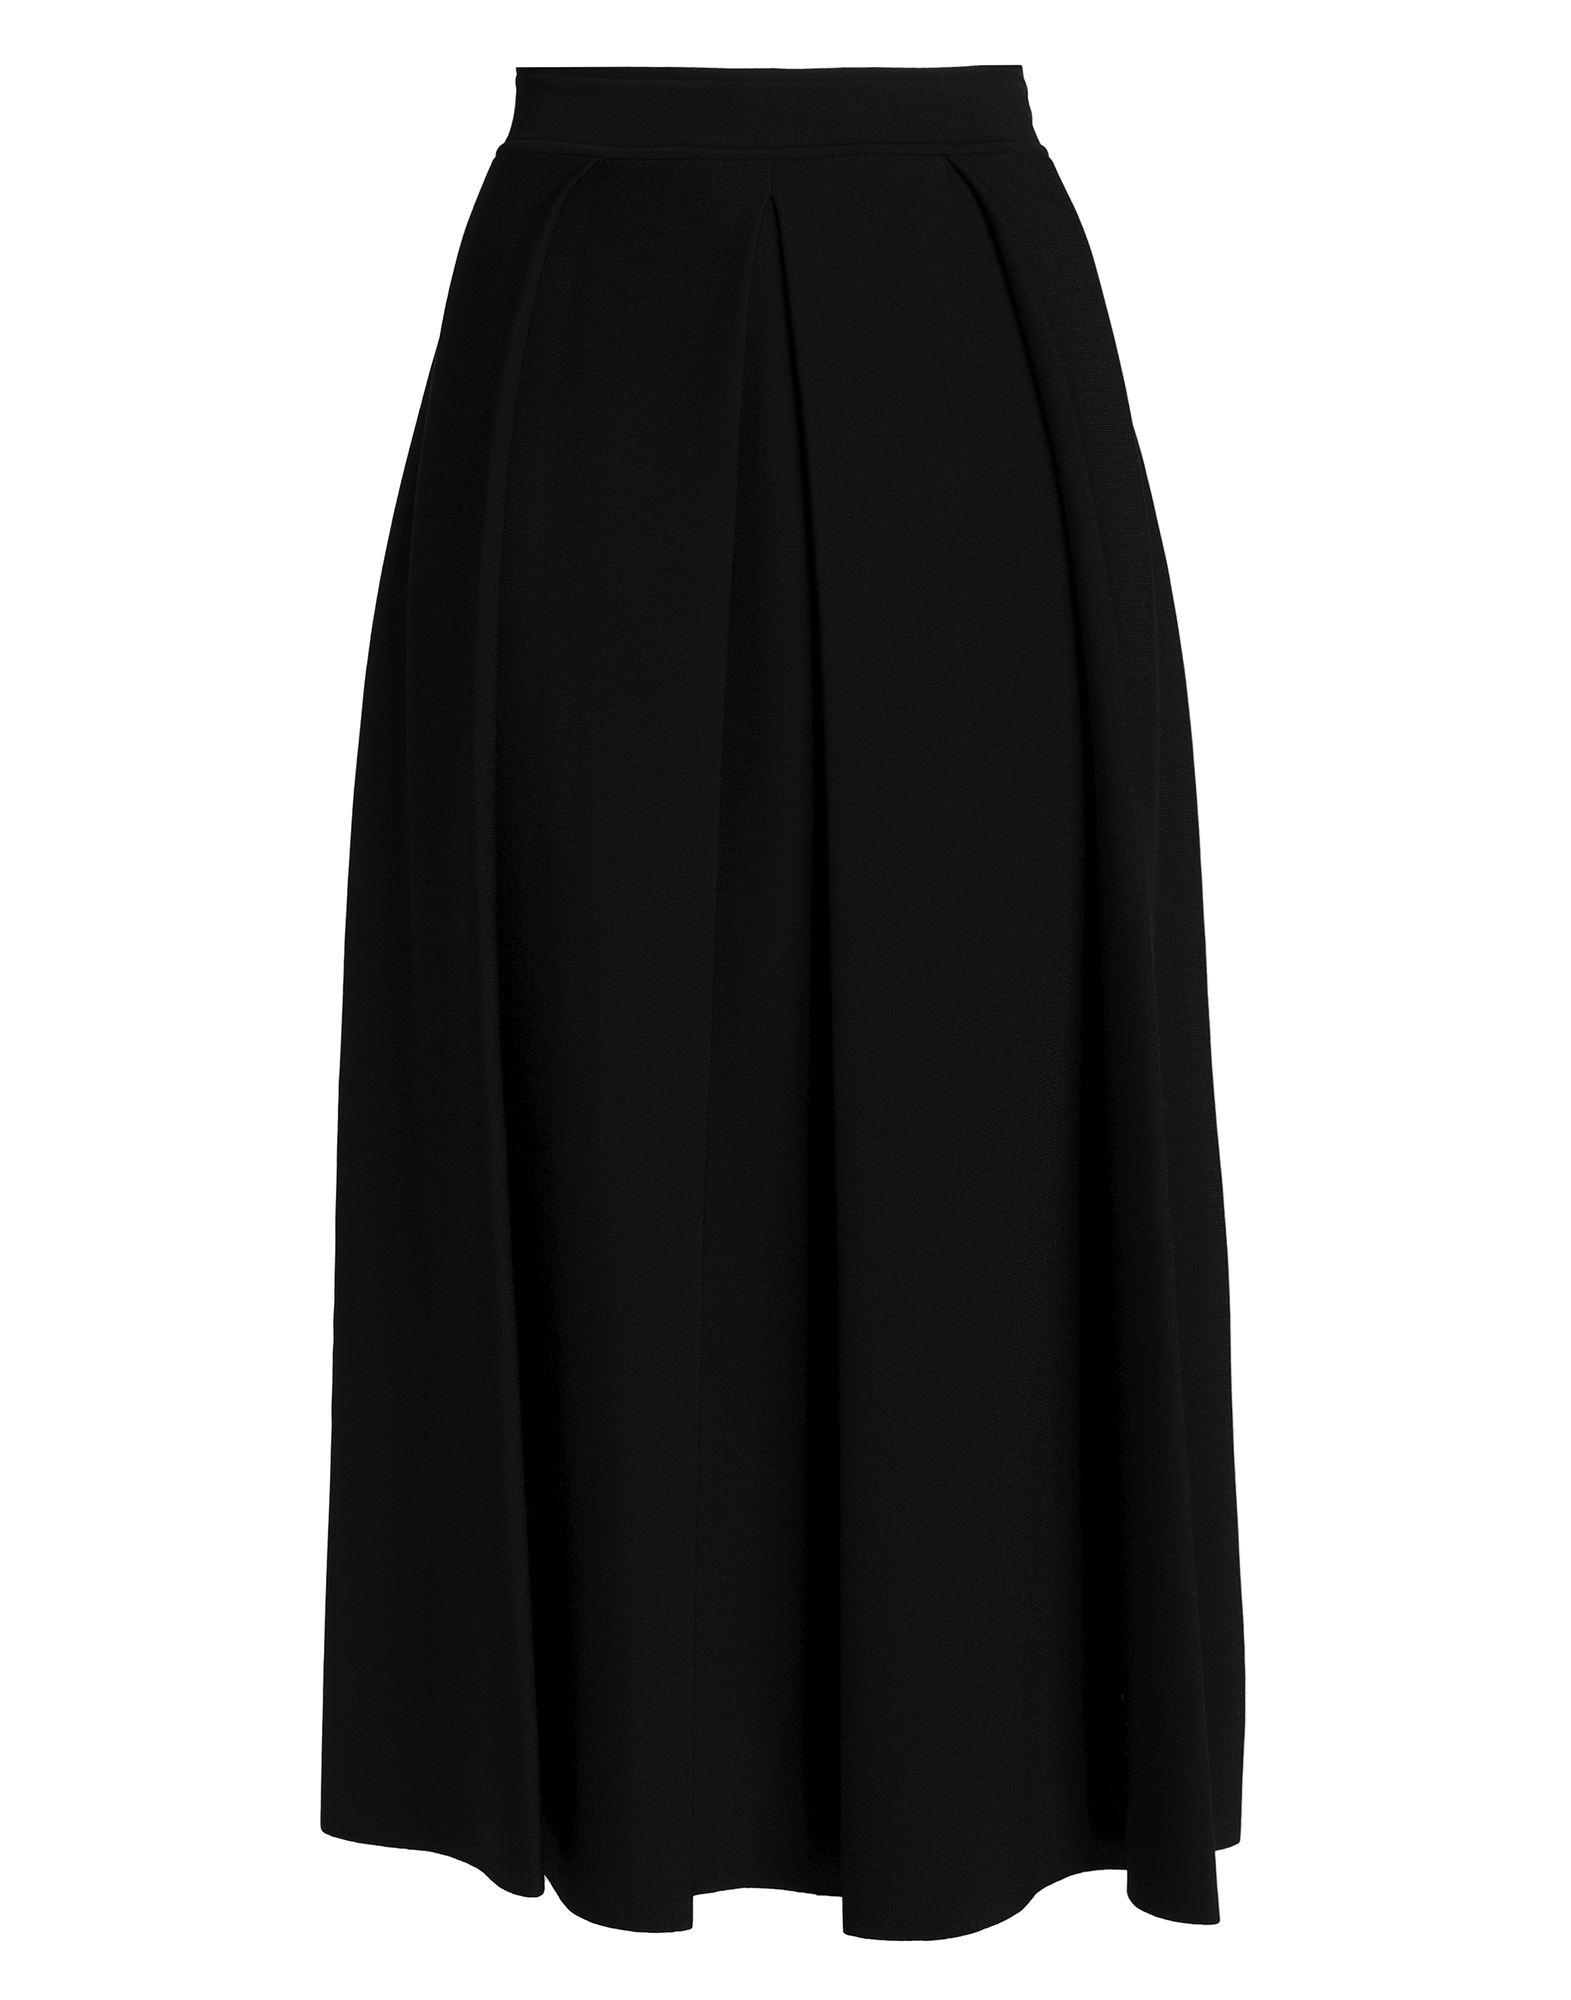 Gentryportofino Midi Skirts